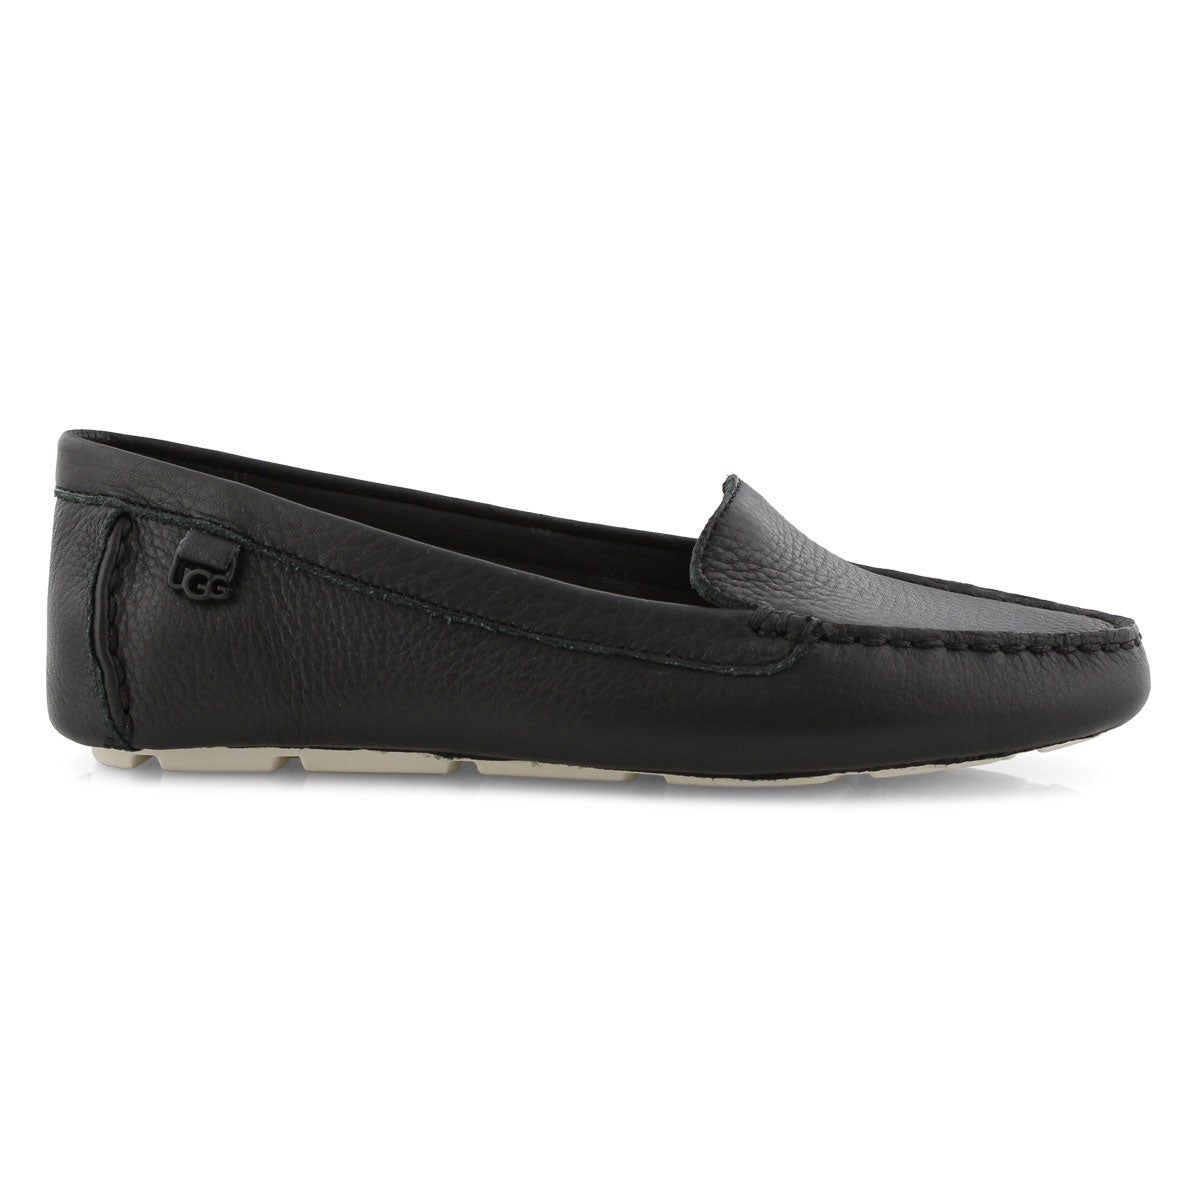 Lds Flores black casual slip on shoe